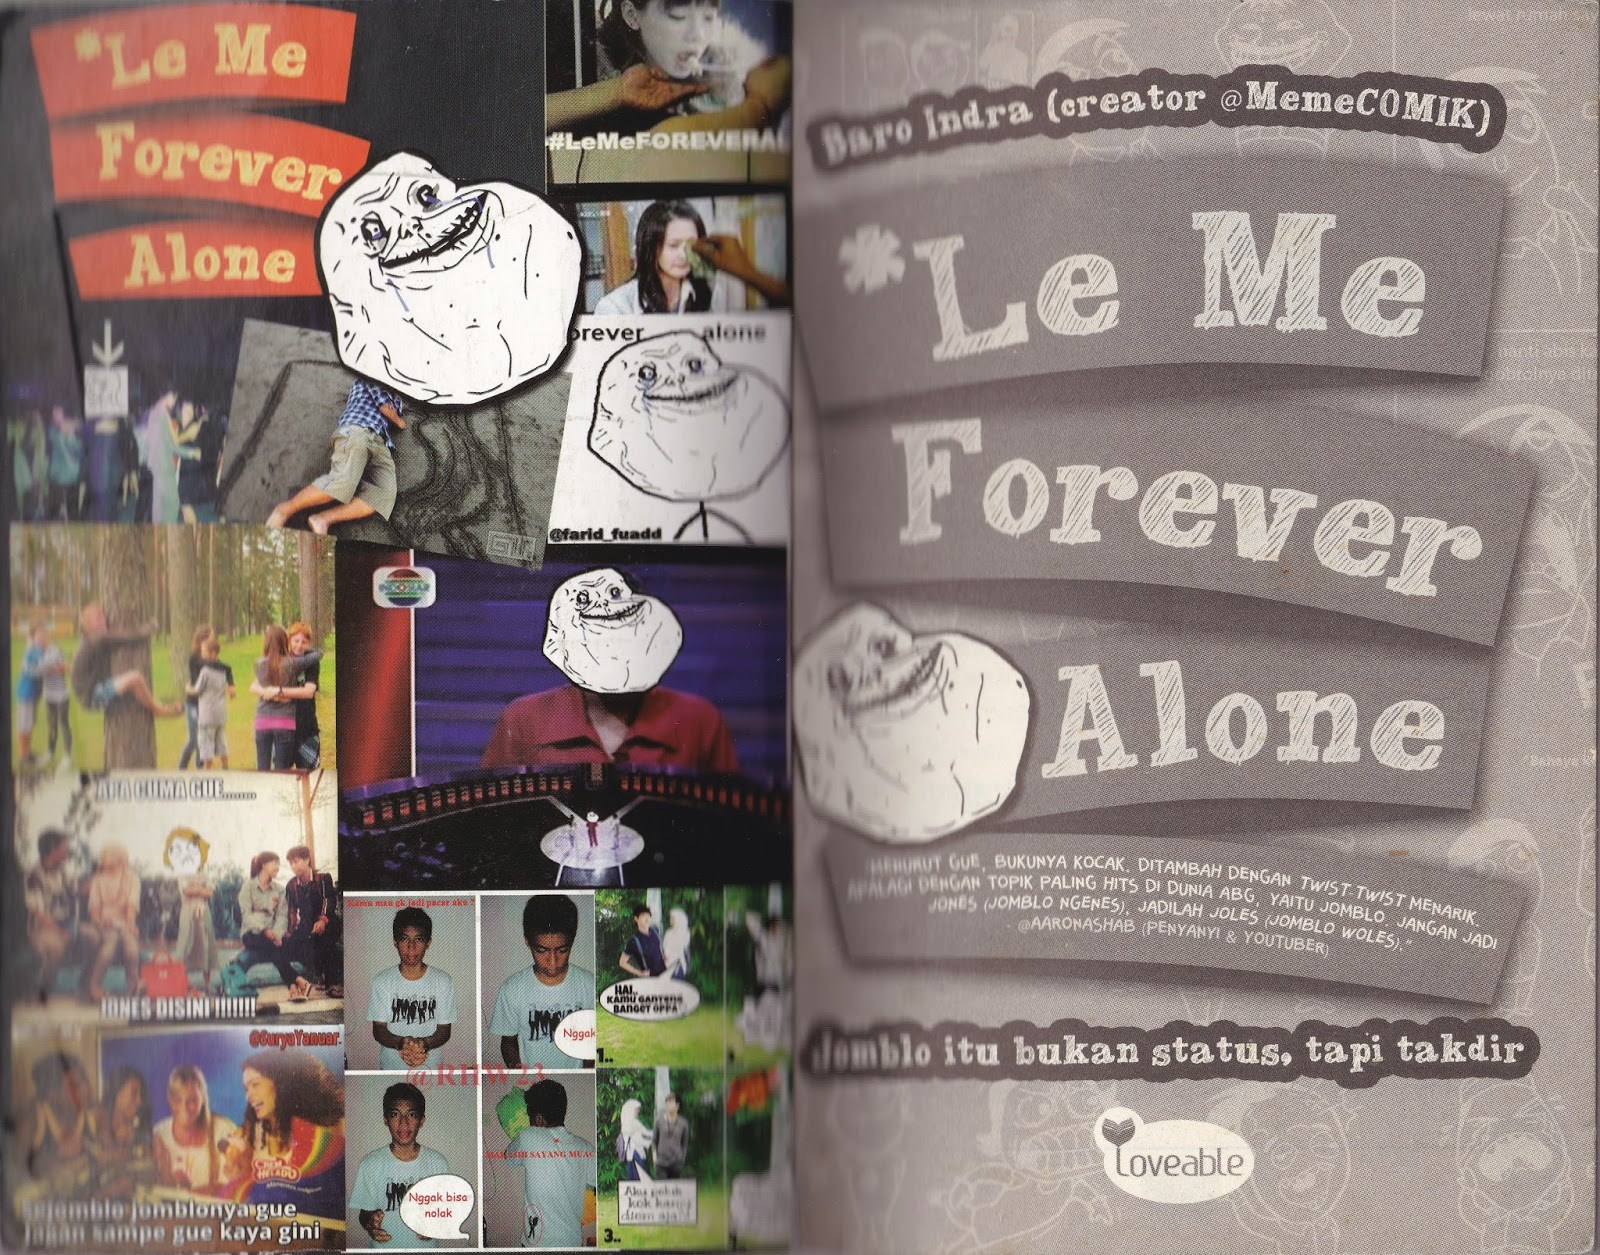 Review Buku 'Le Me Forever Alone' | Az World